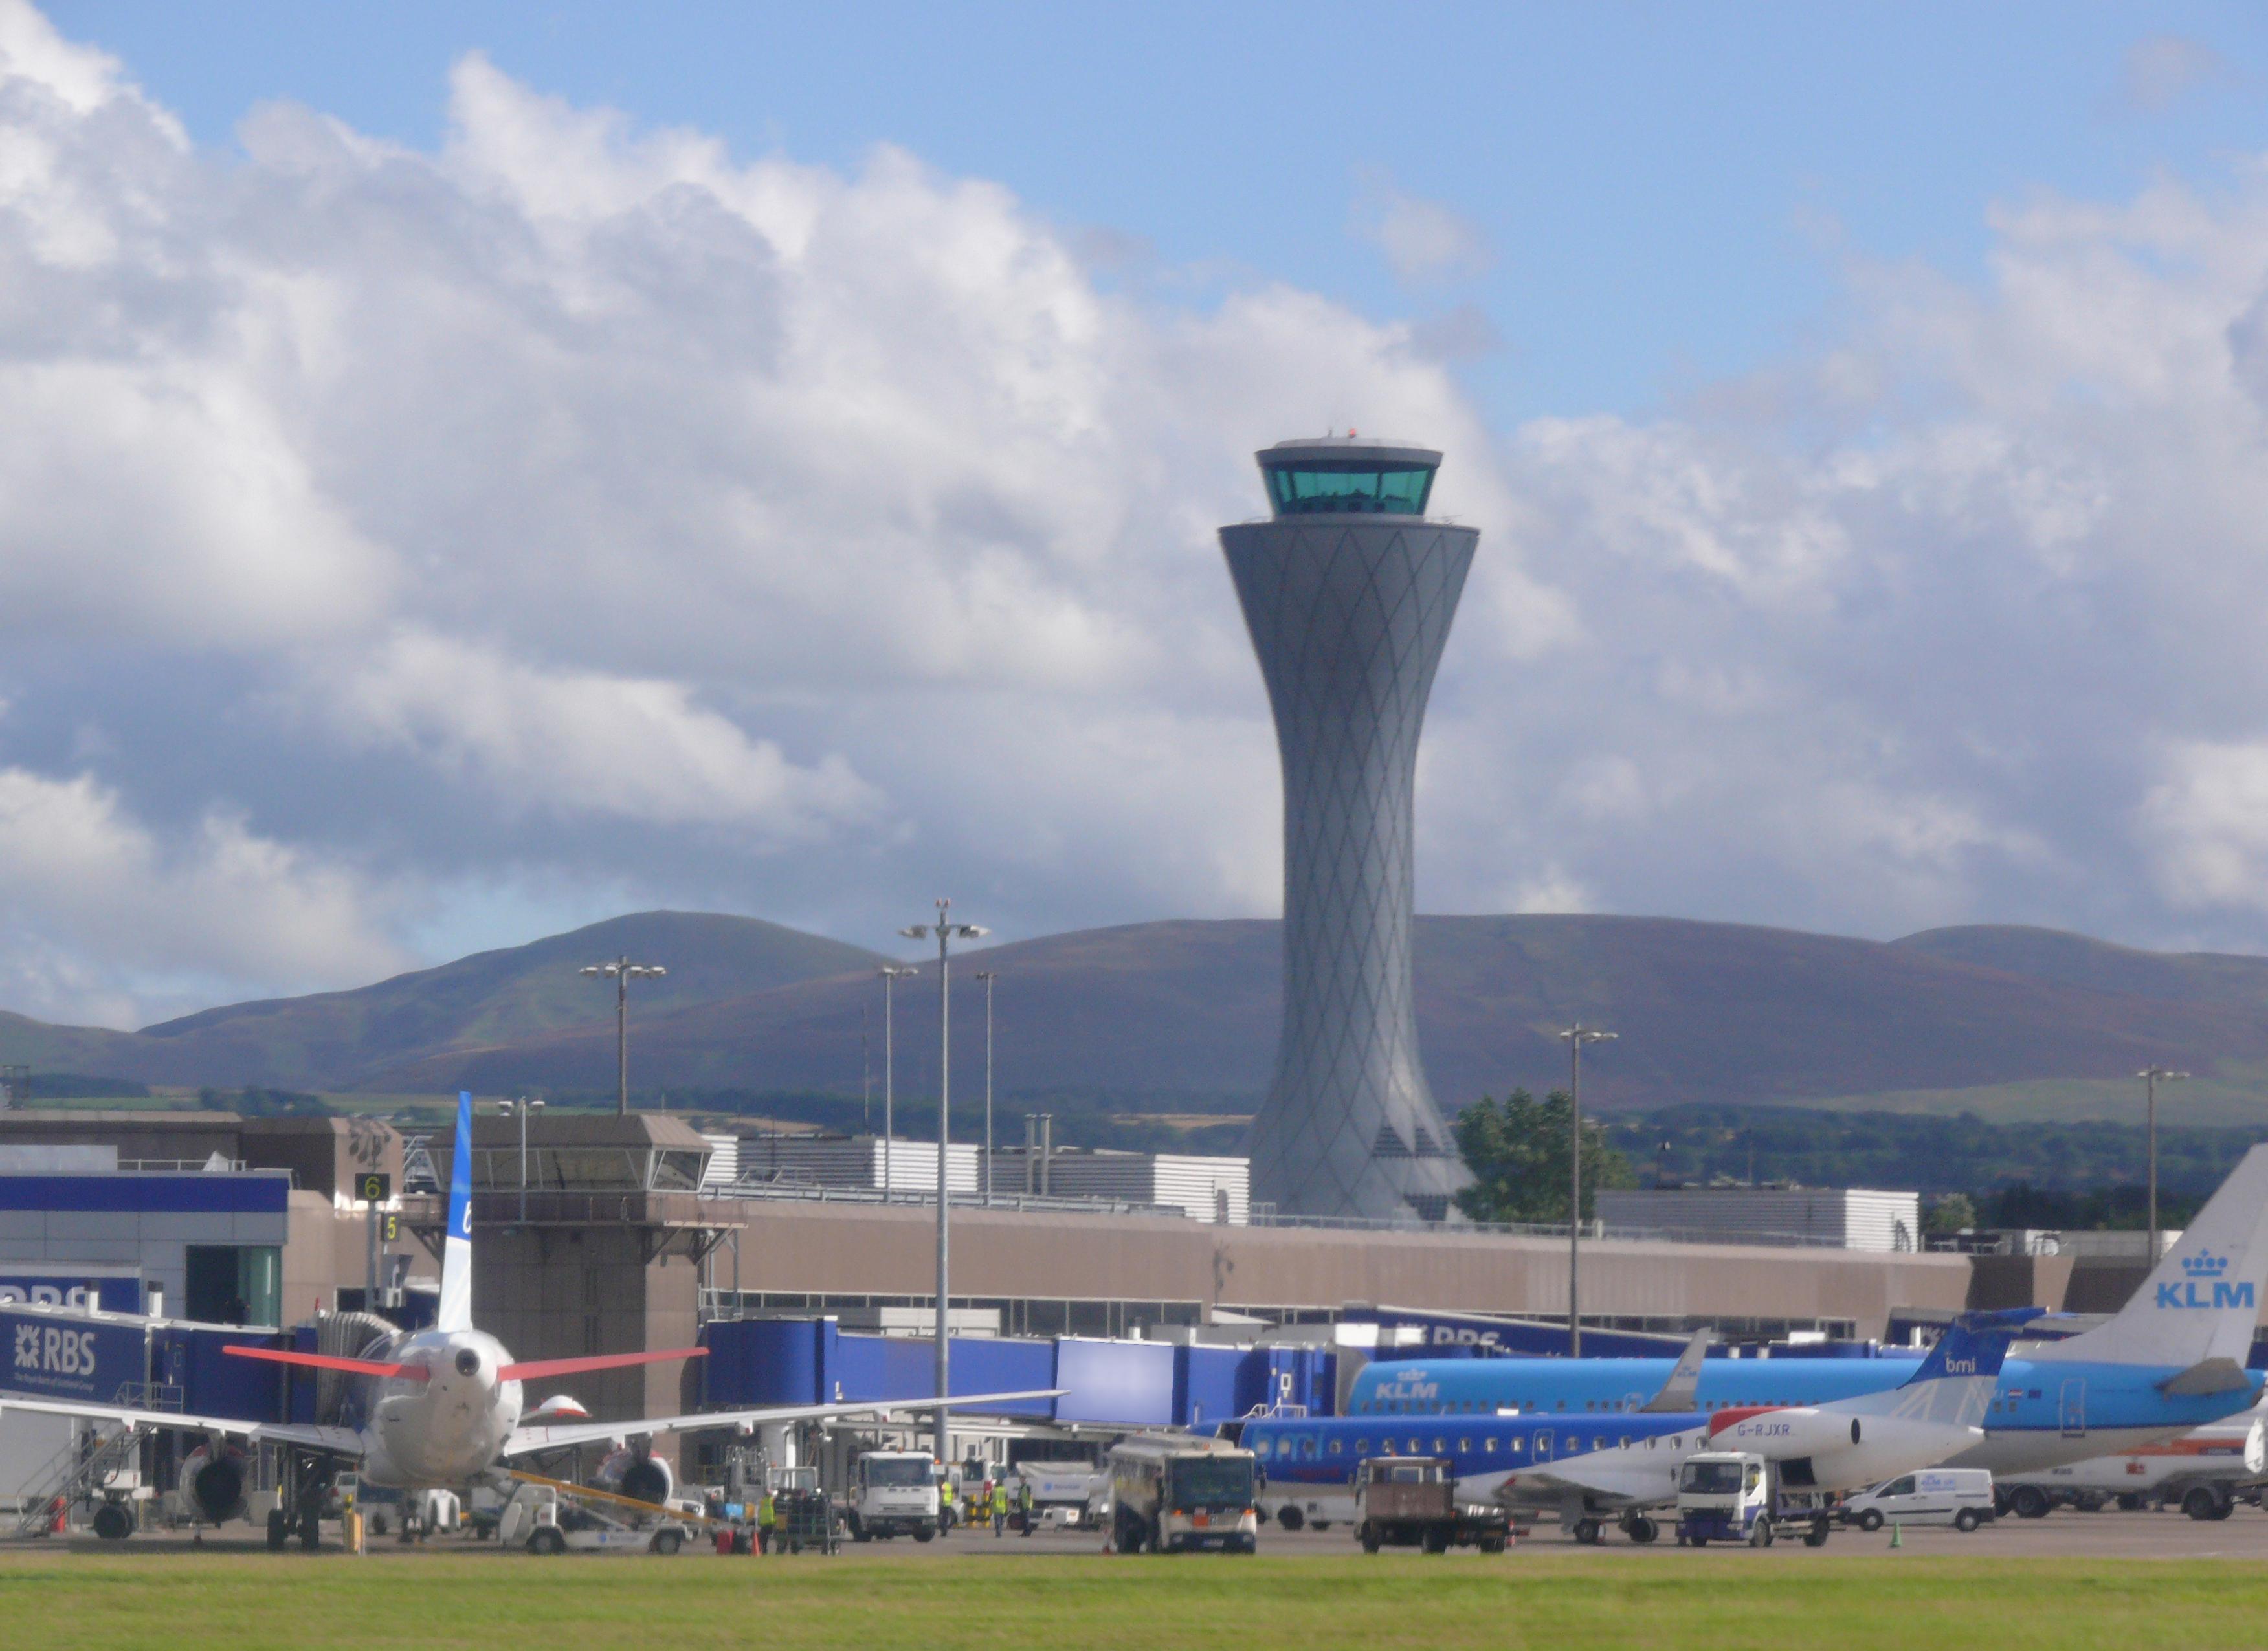 Edinburghin lentoasema